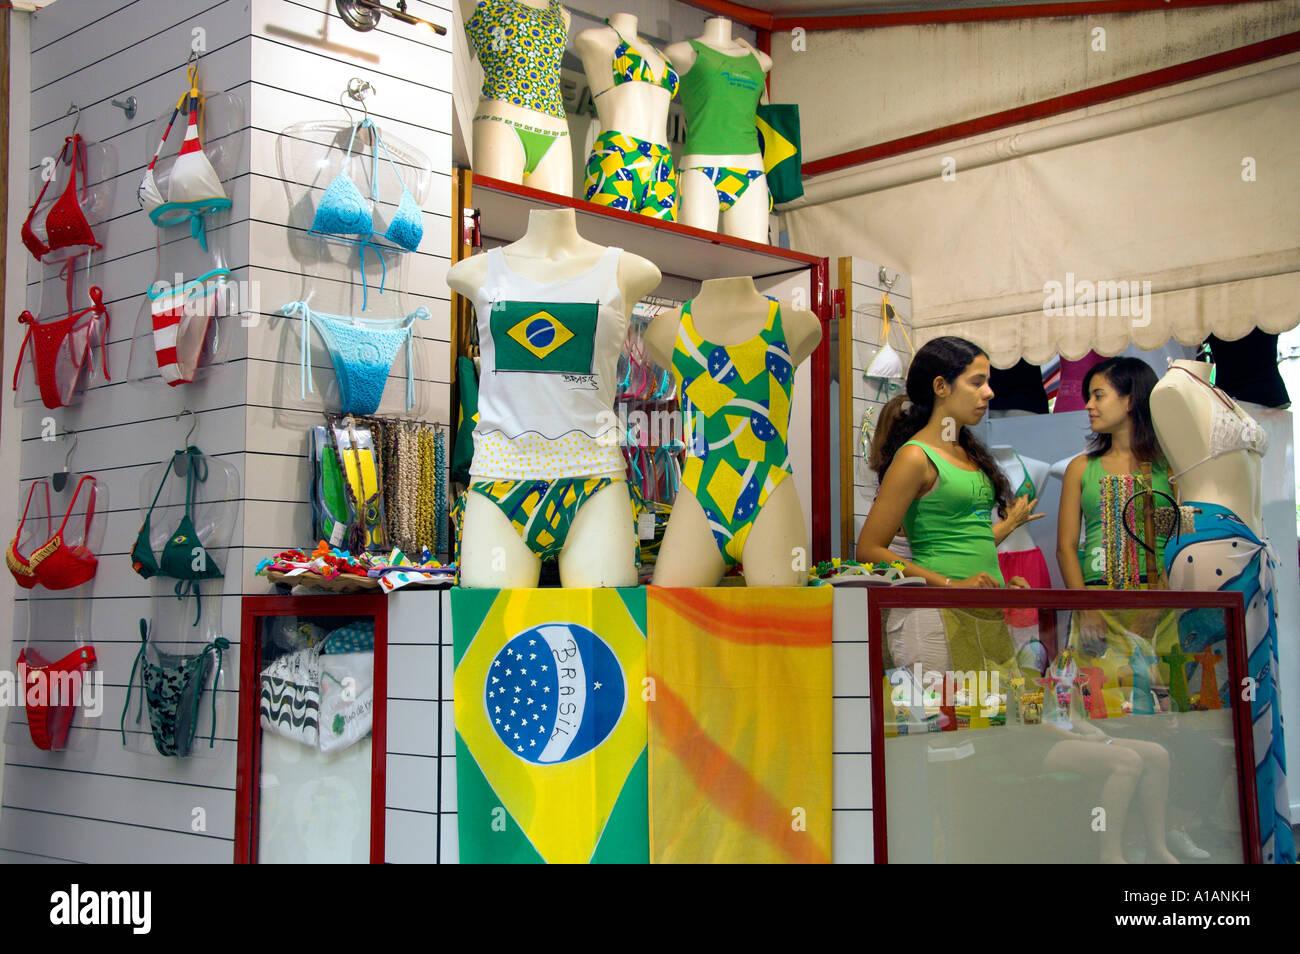 A Bikini And Swim Suit Shop In Rio De Janeiro Brazil Stock Photo Alamy